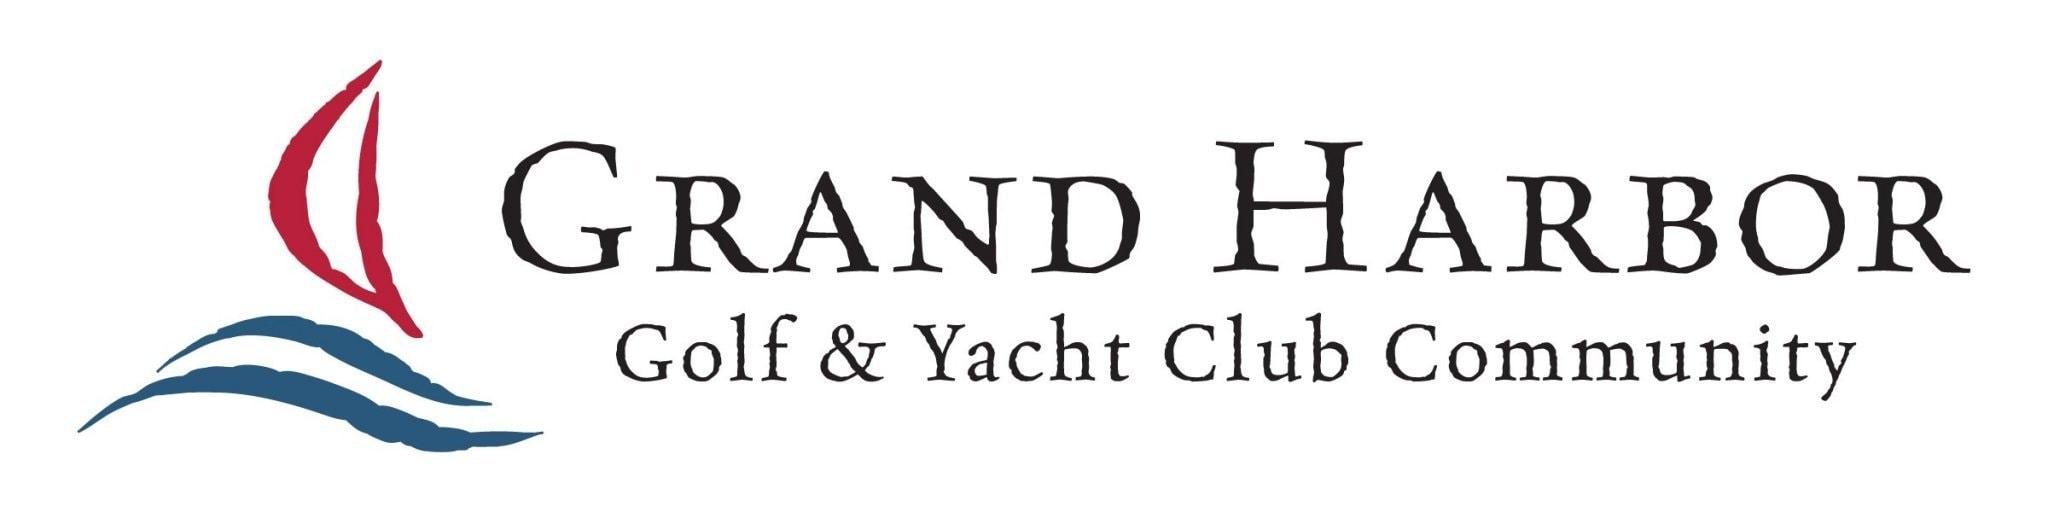 Grand Harbor